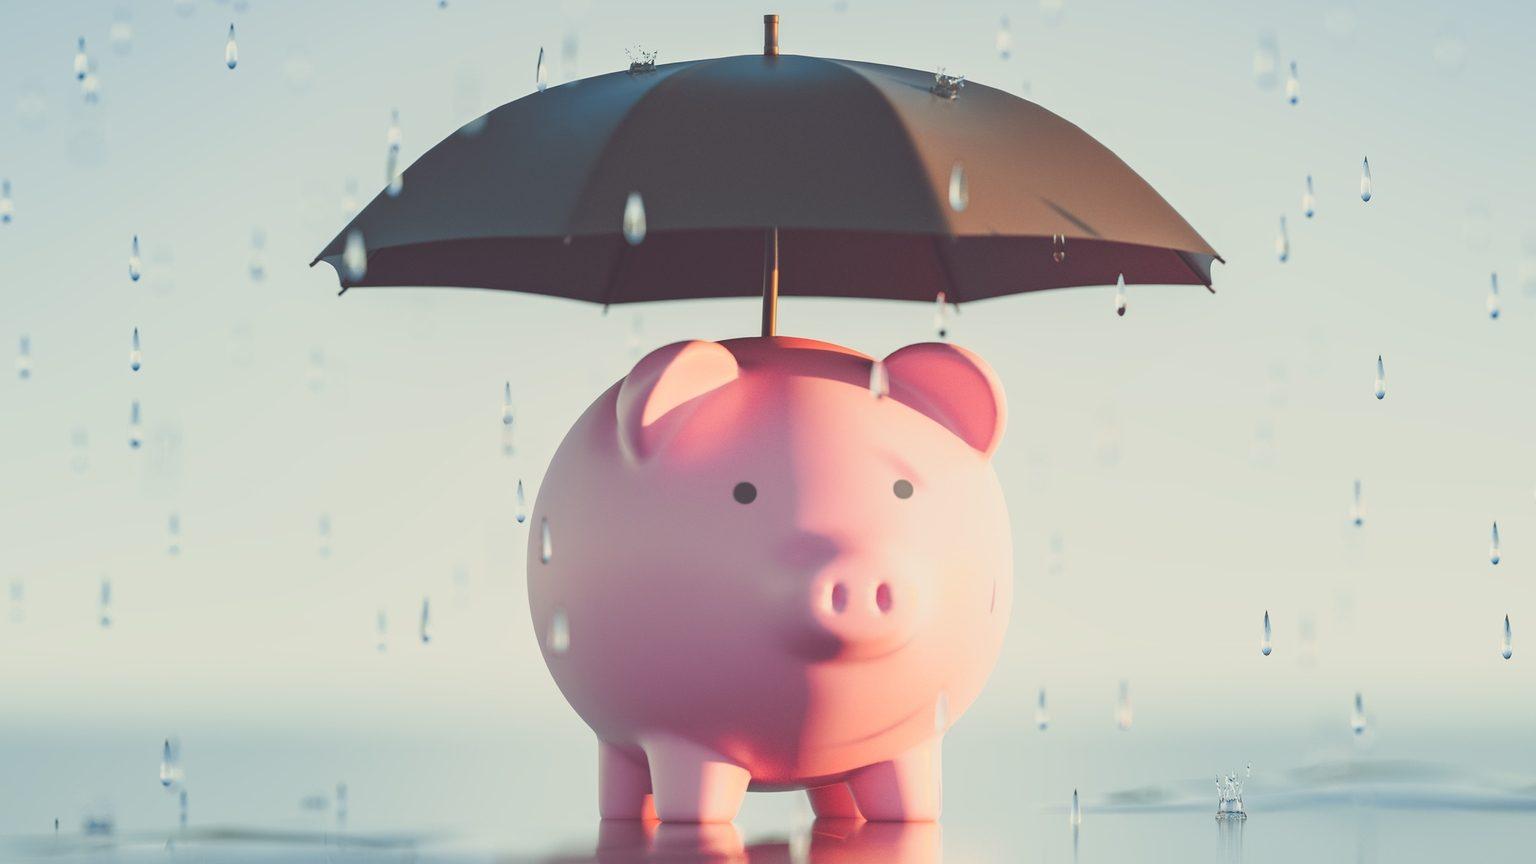 Rainy Day Fund Piggy Bank Umbrella